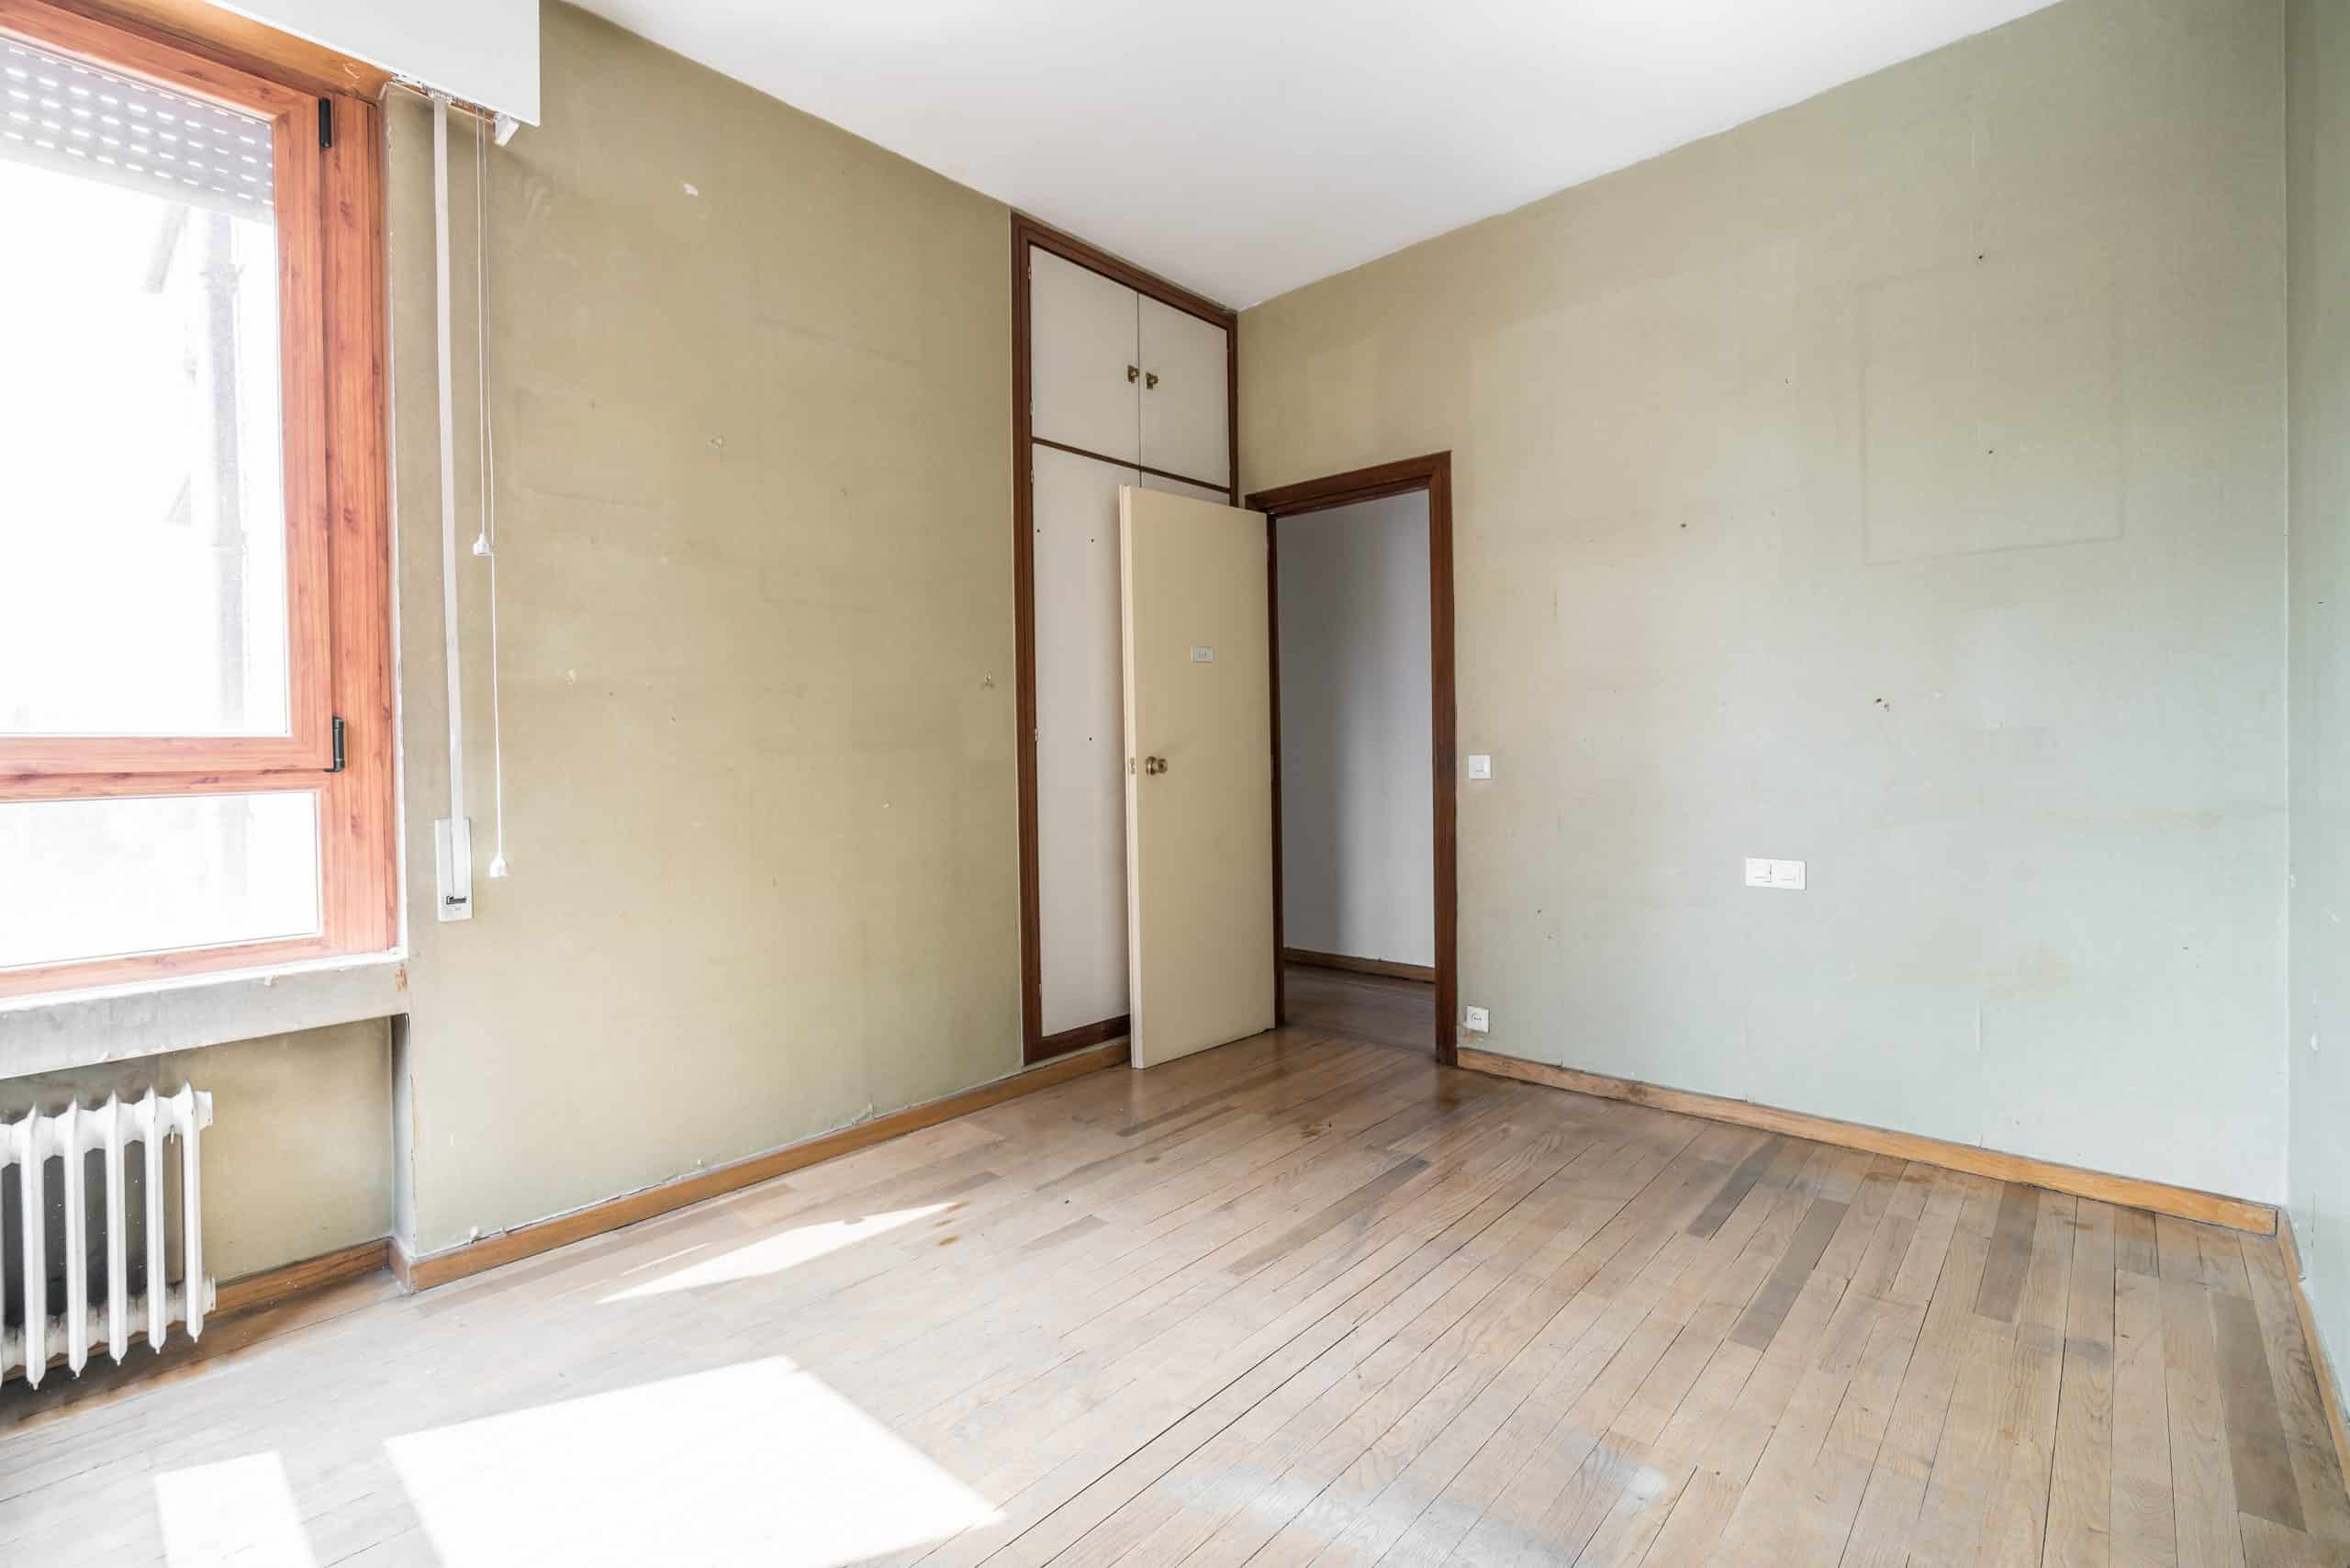 Agencia Inmobiliaria de Madrid-FUTUROCASA-Zona ARGANZUELA-EMBAJADORES-LEGAZPI -calle Embajadores- baño 140